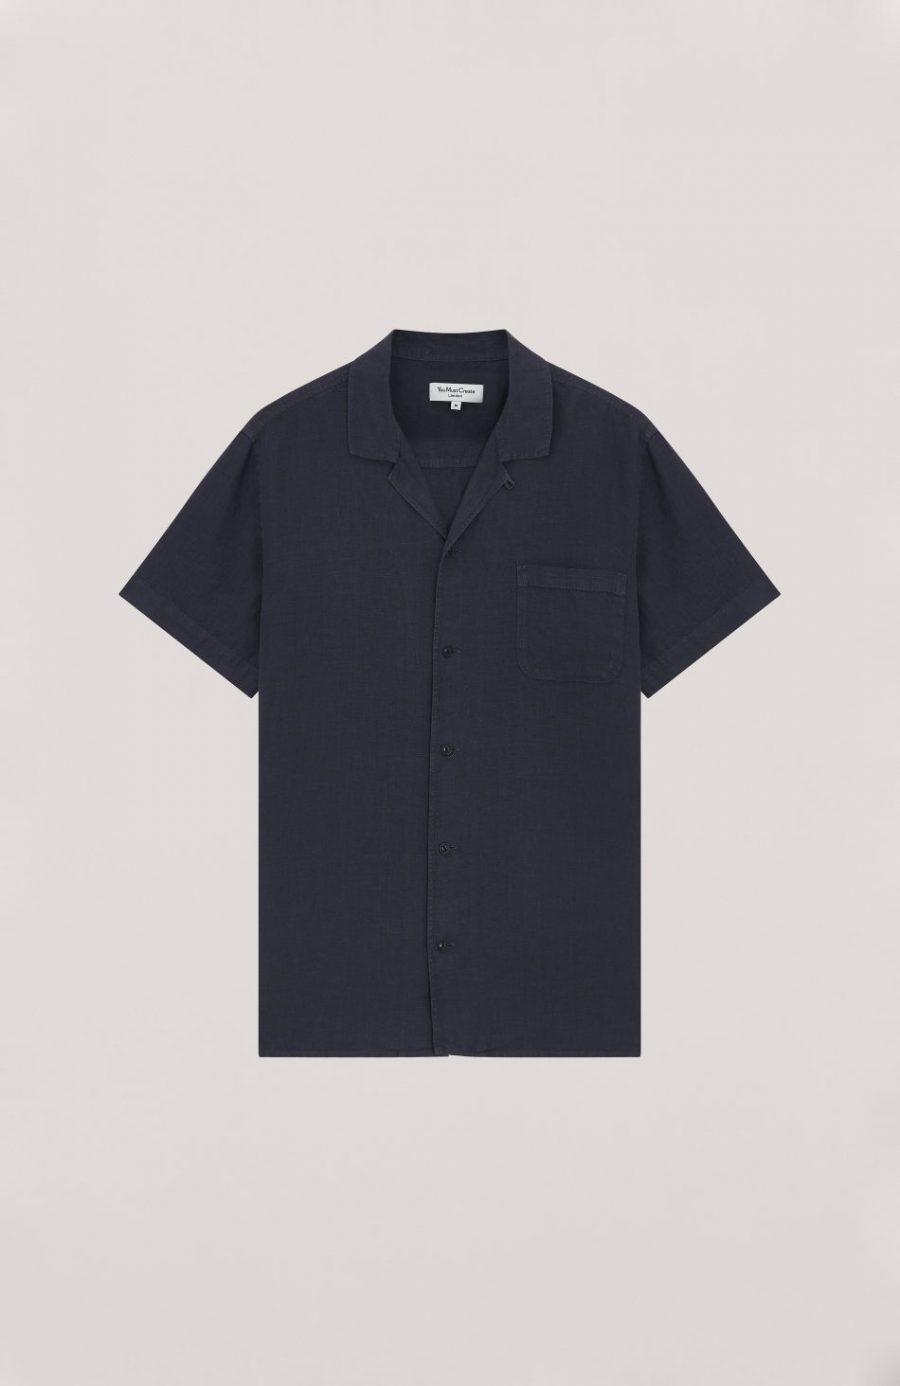 P2NAC-Malick-Shirt-Navy-950×1463